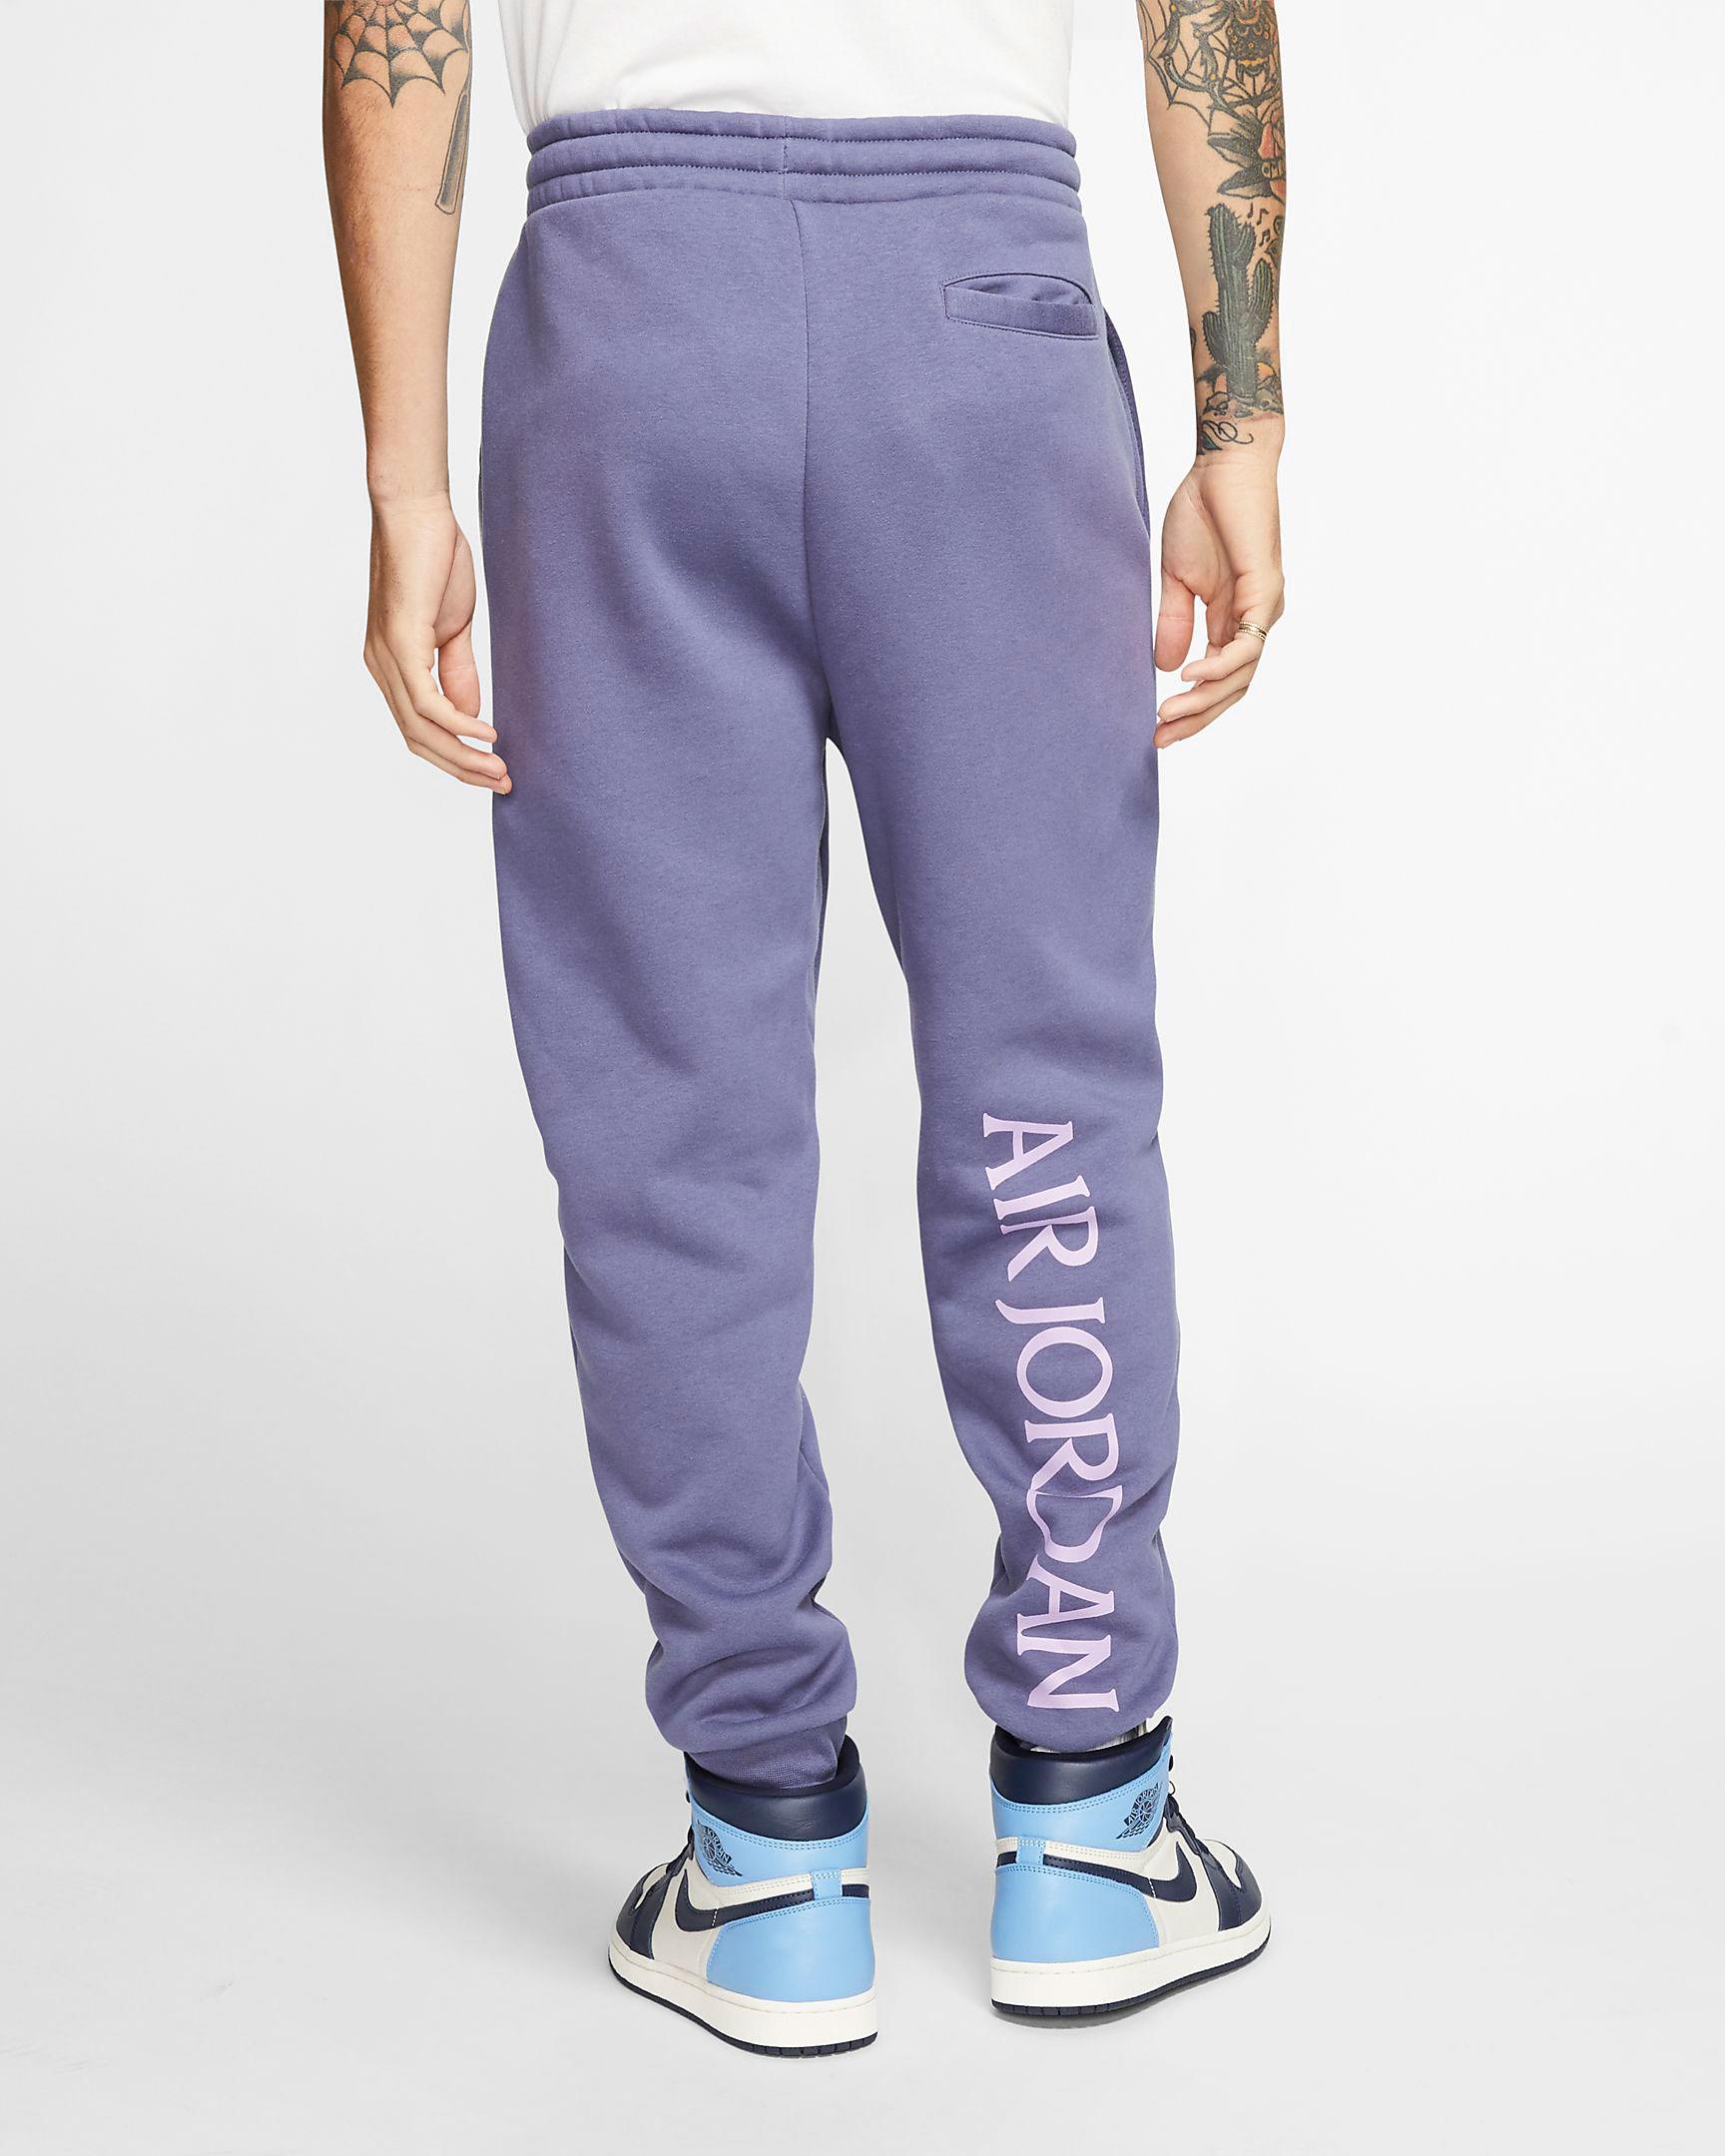 purple-metallic-jordan-4-pants-2